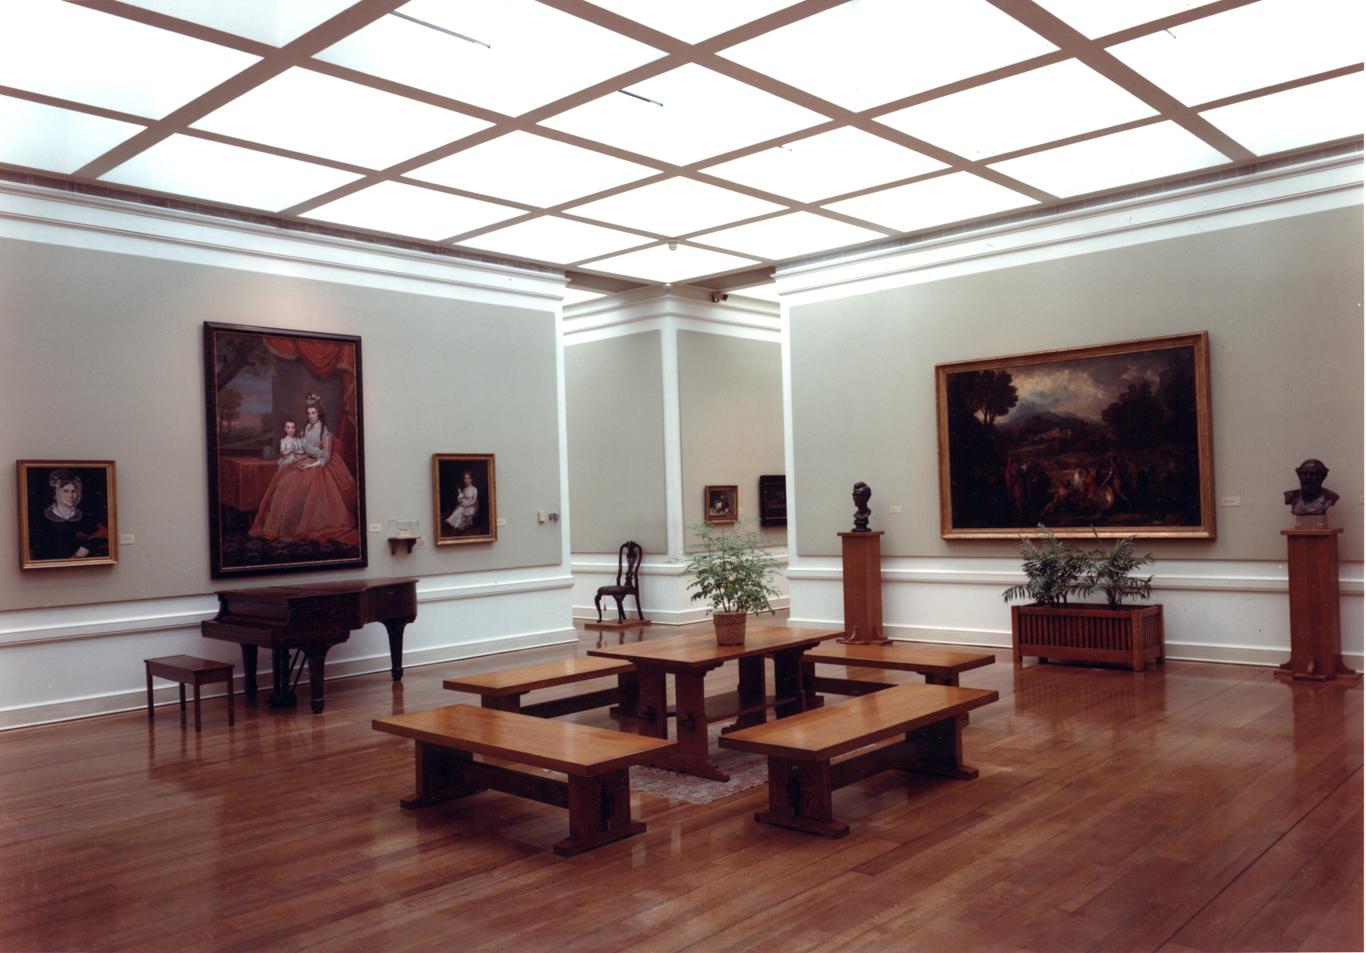 Huntington Art Gallery, San Marino, CA